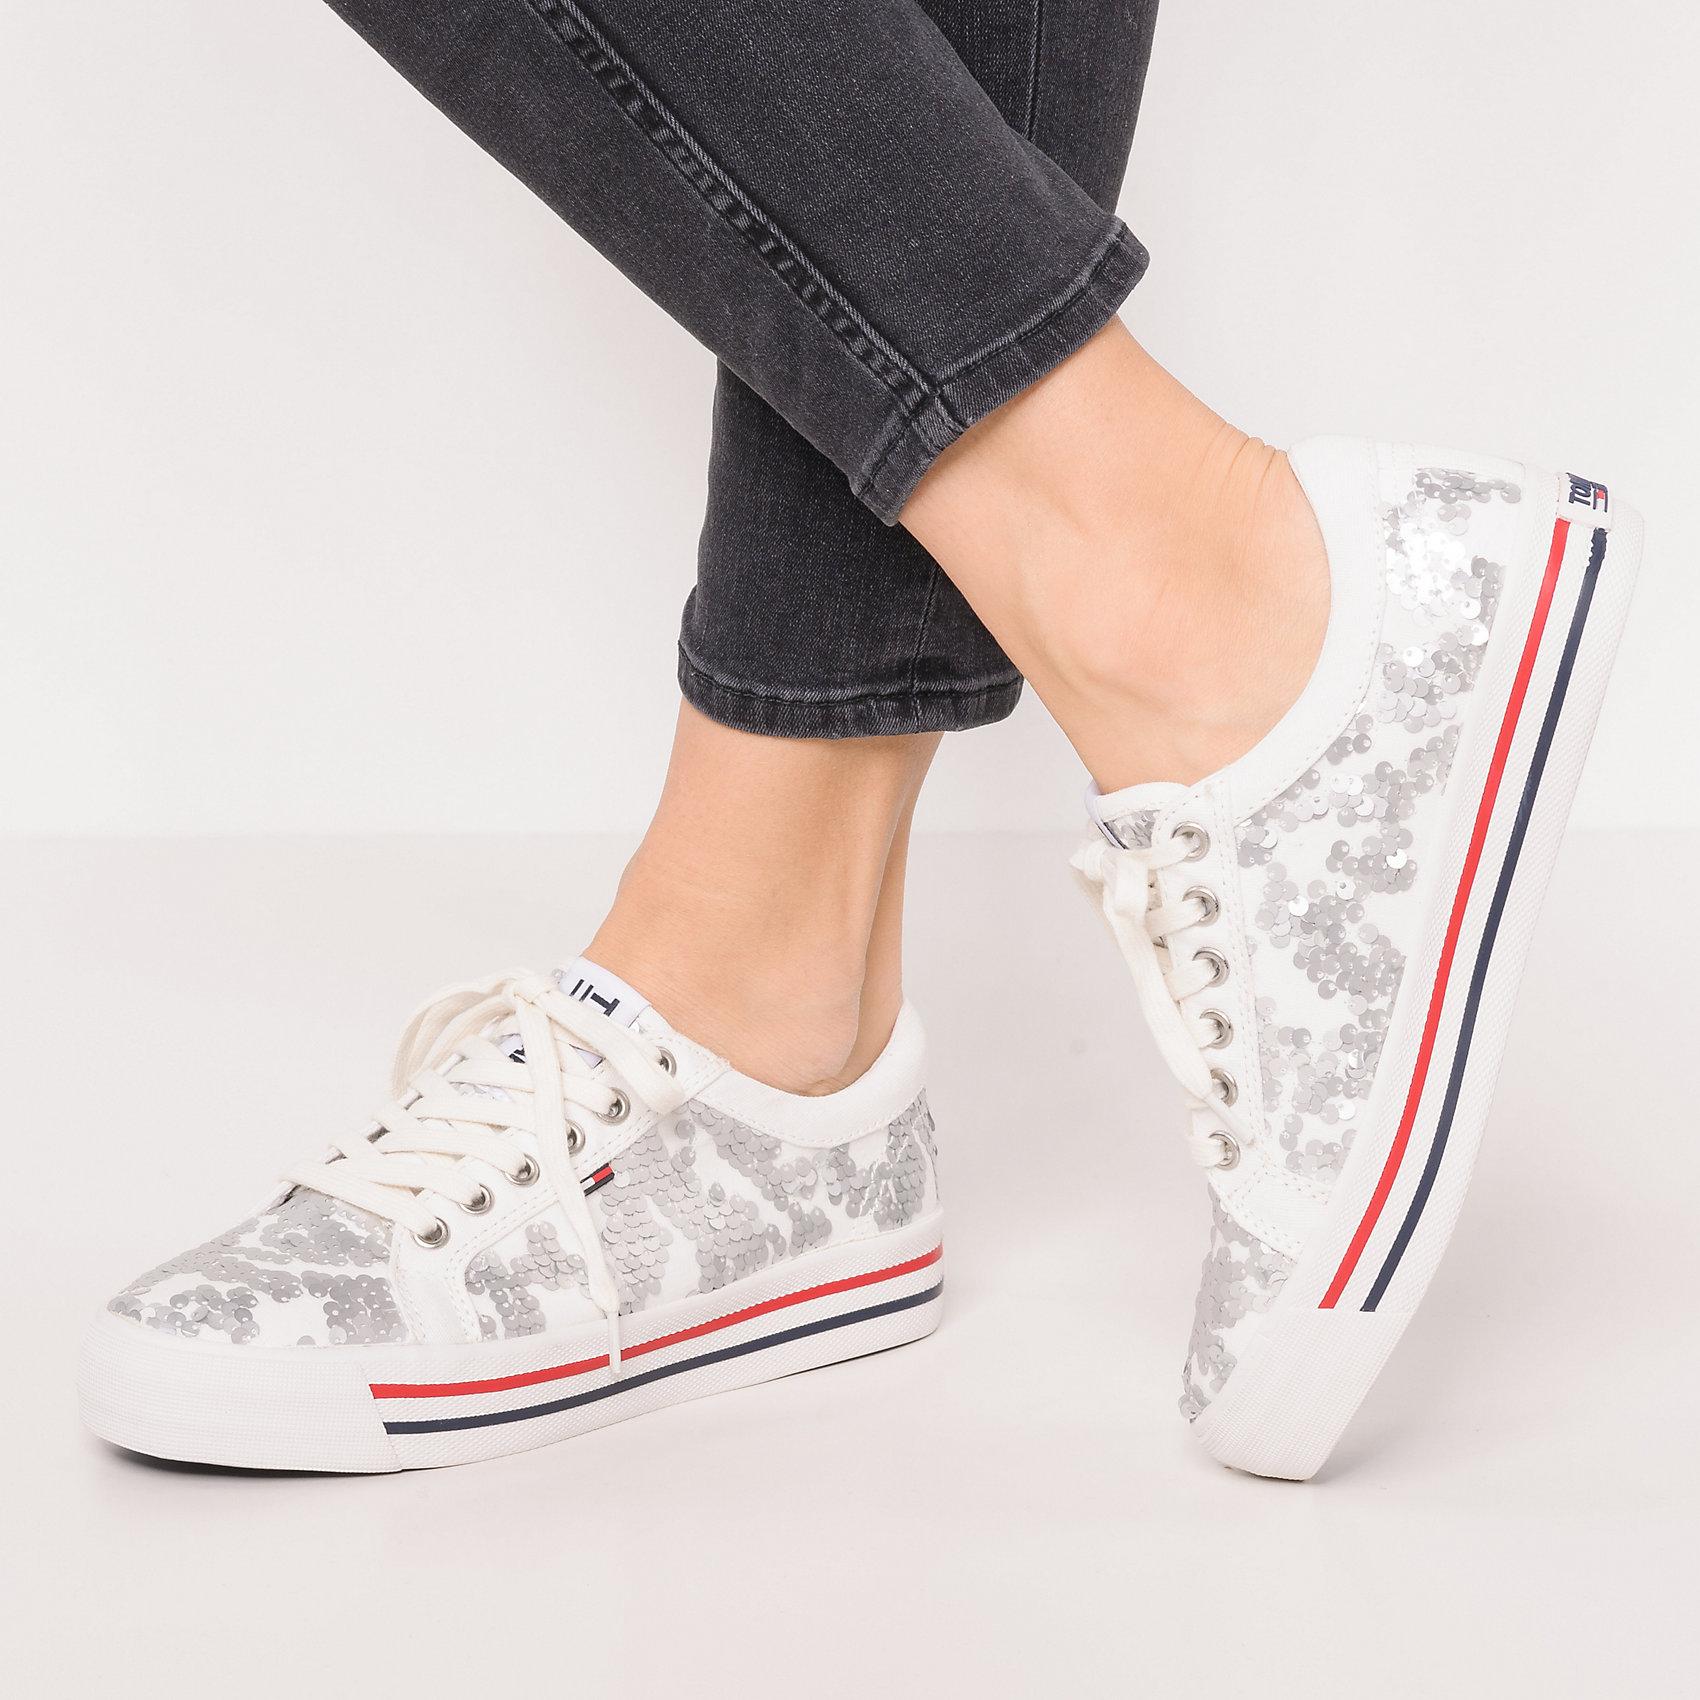 Neu TJ TOMMY JEANS TJ Neu Fashion Sequin Sneaker Sneakers Niedrig 7151695 für Damen 34eda6